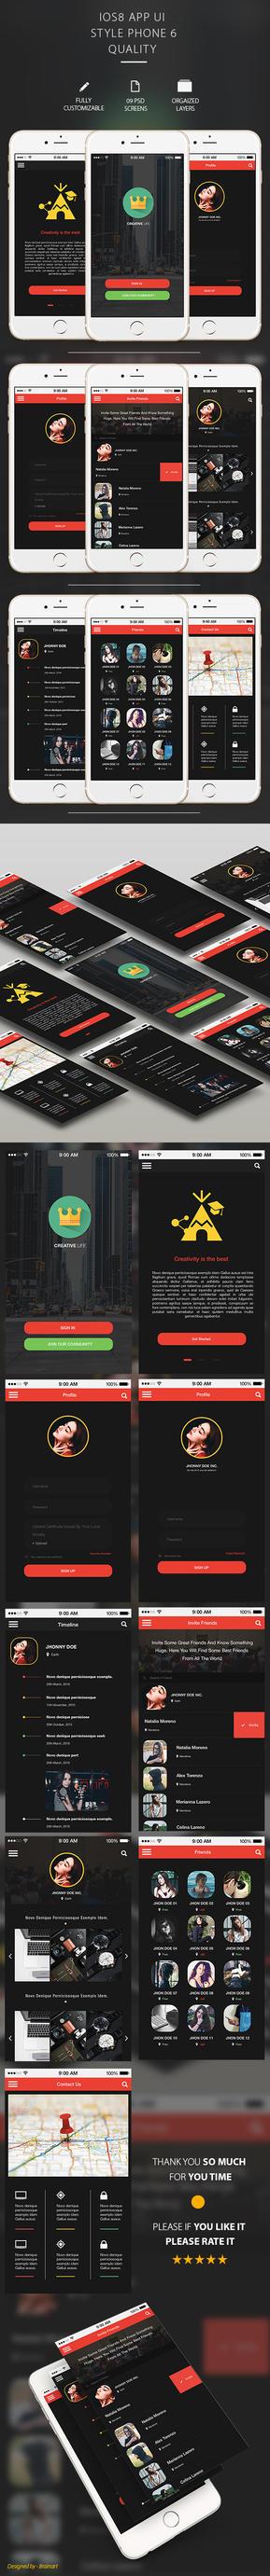 Creativelife Flat Mobile App UI by Hz-designer